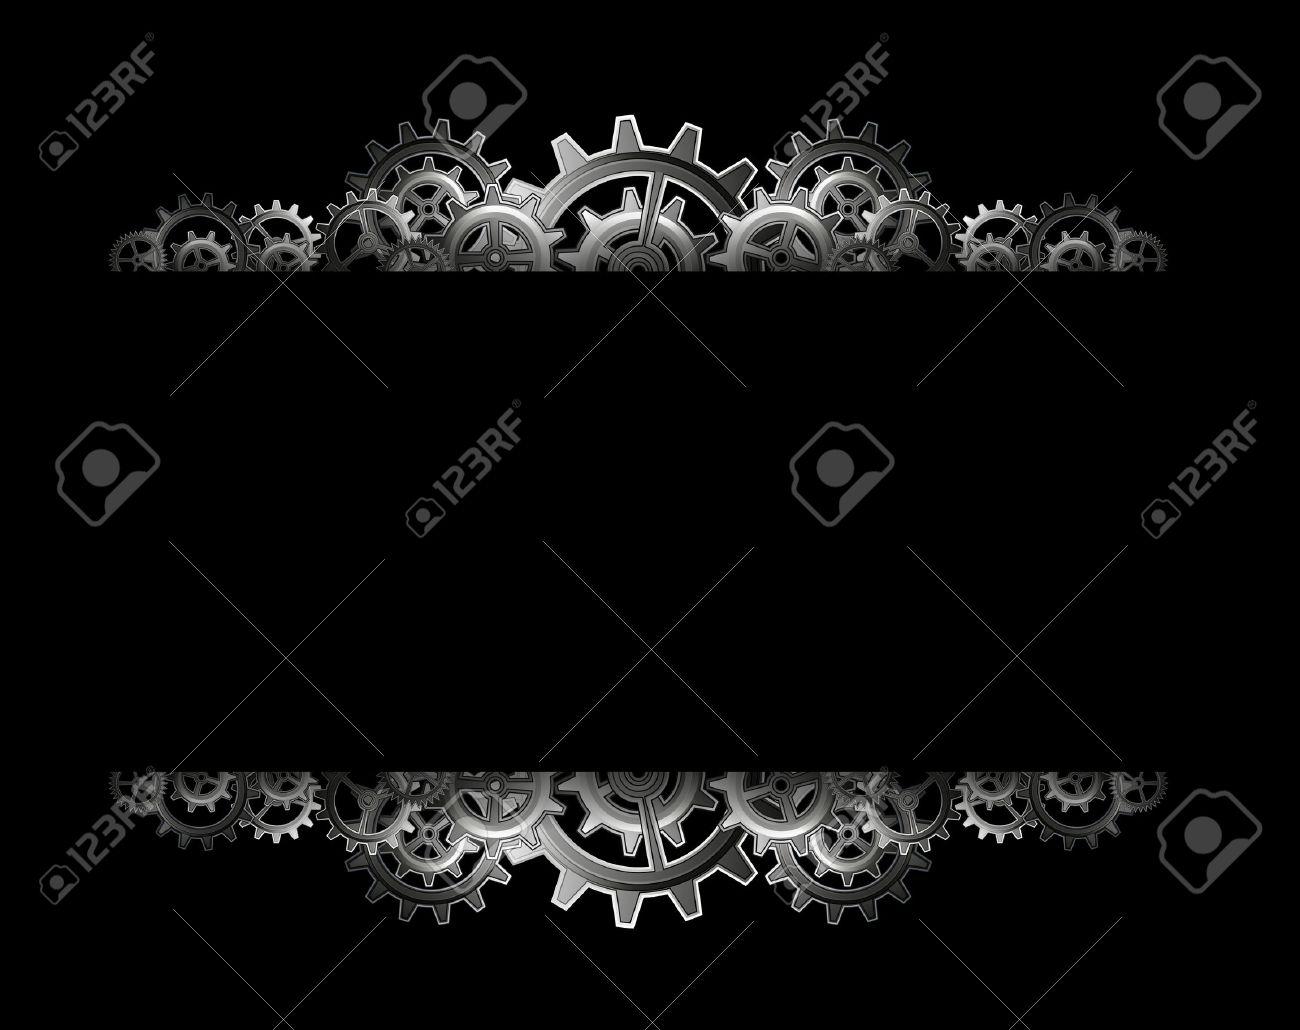 Steampunk gears frame - 24012677